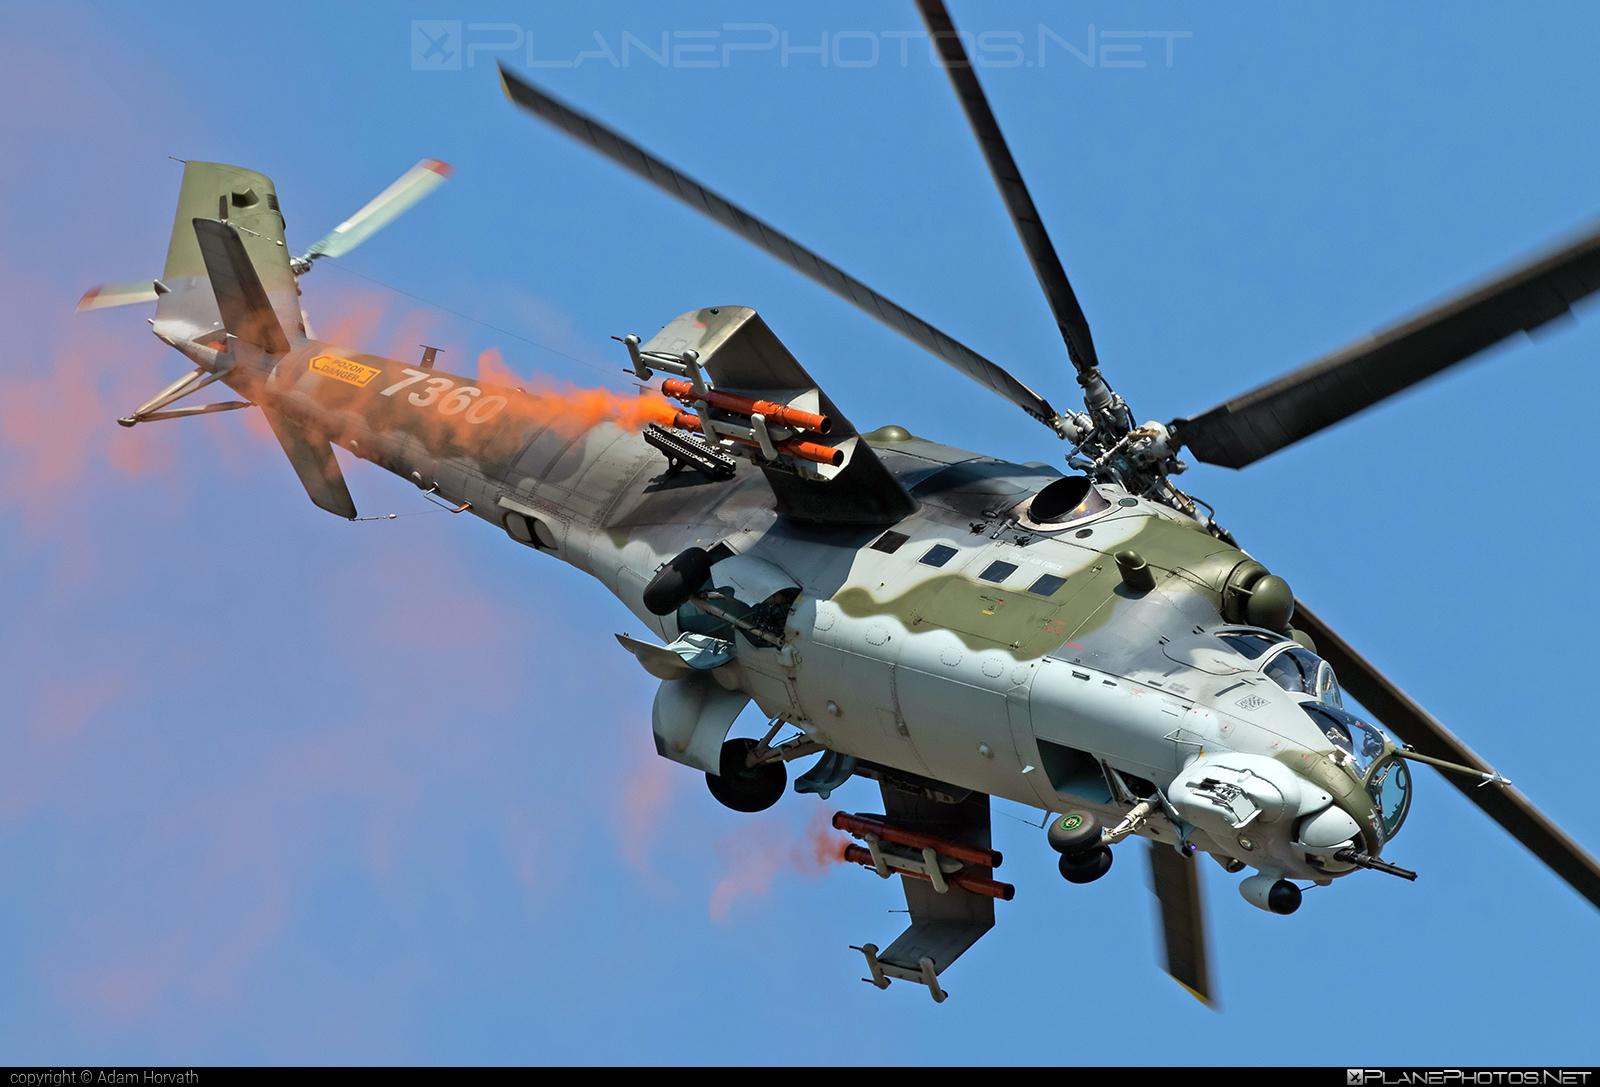 Mil Mi-35 - 7360 operated by Vzdušné síly AČR (Czech Air Force) #czechairforce #mi35 #mil #milhelicopters #siaf2019 #vzdusnesilyacr